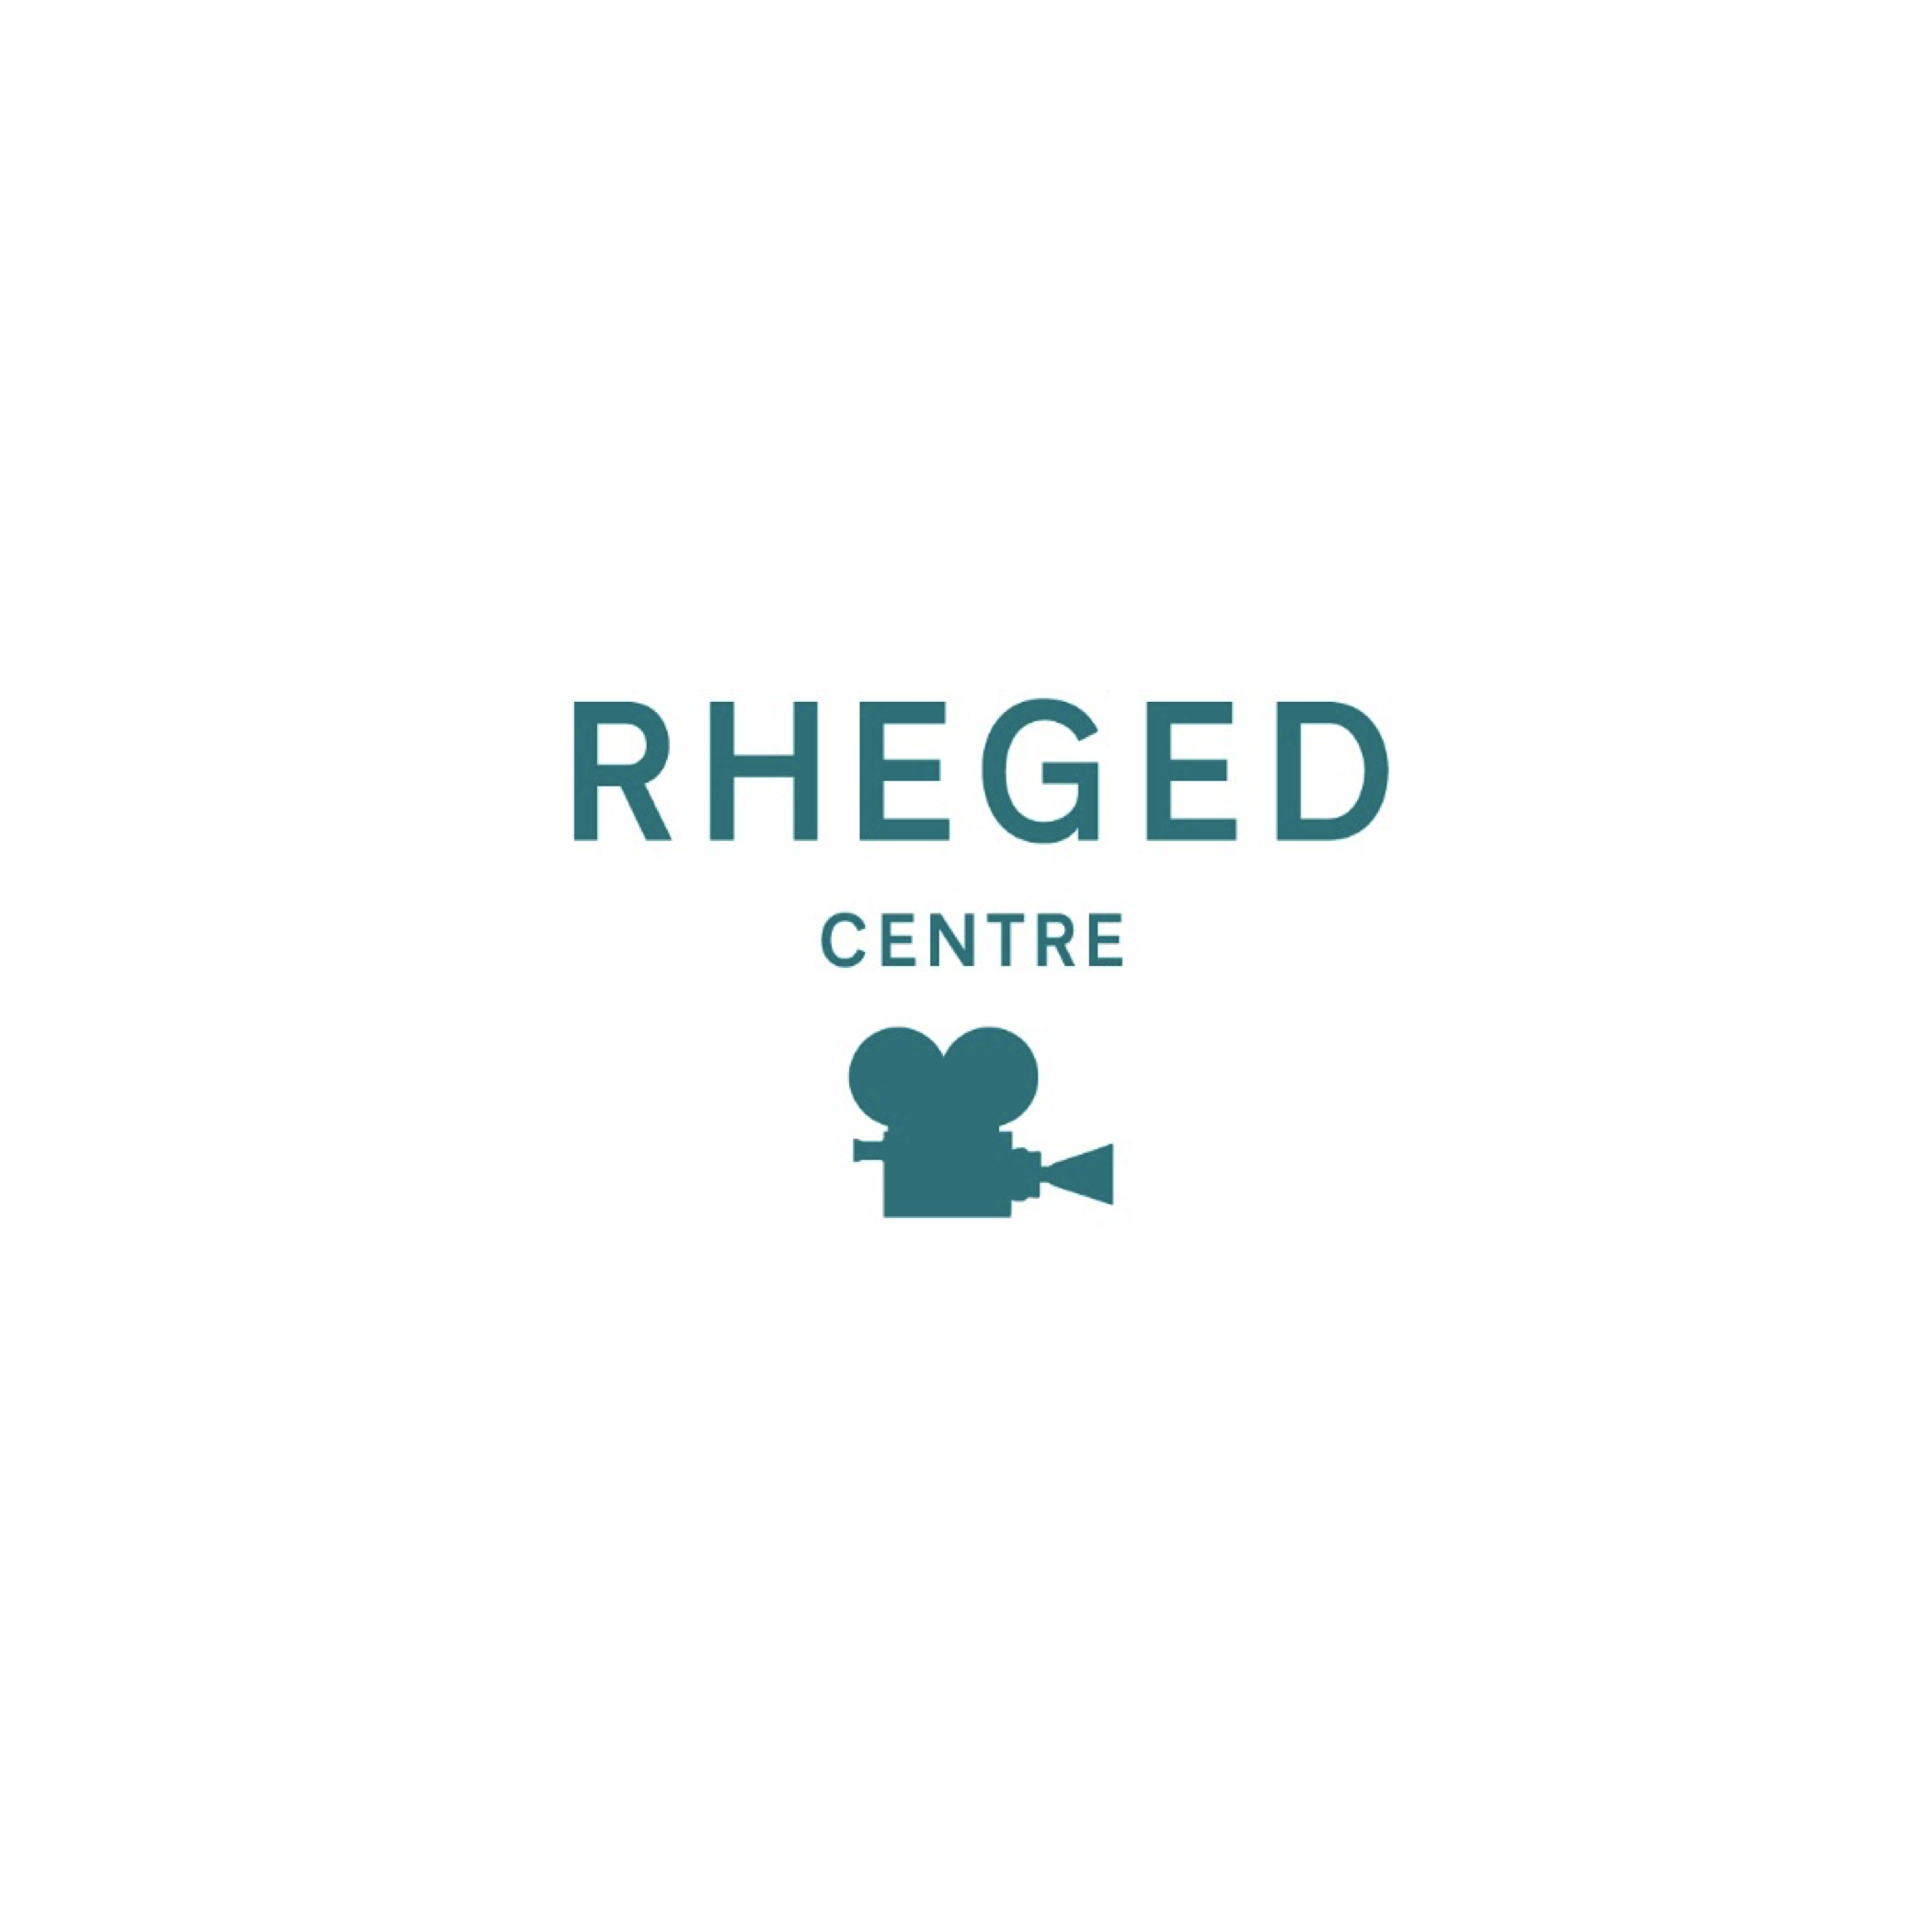 Rheged.png